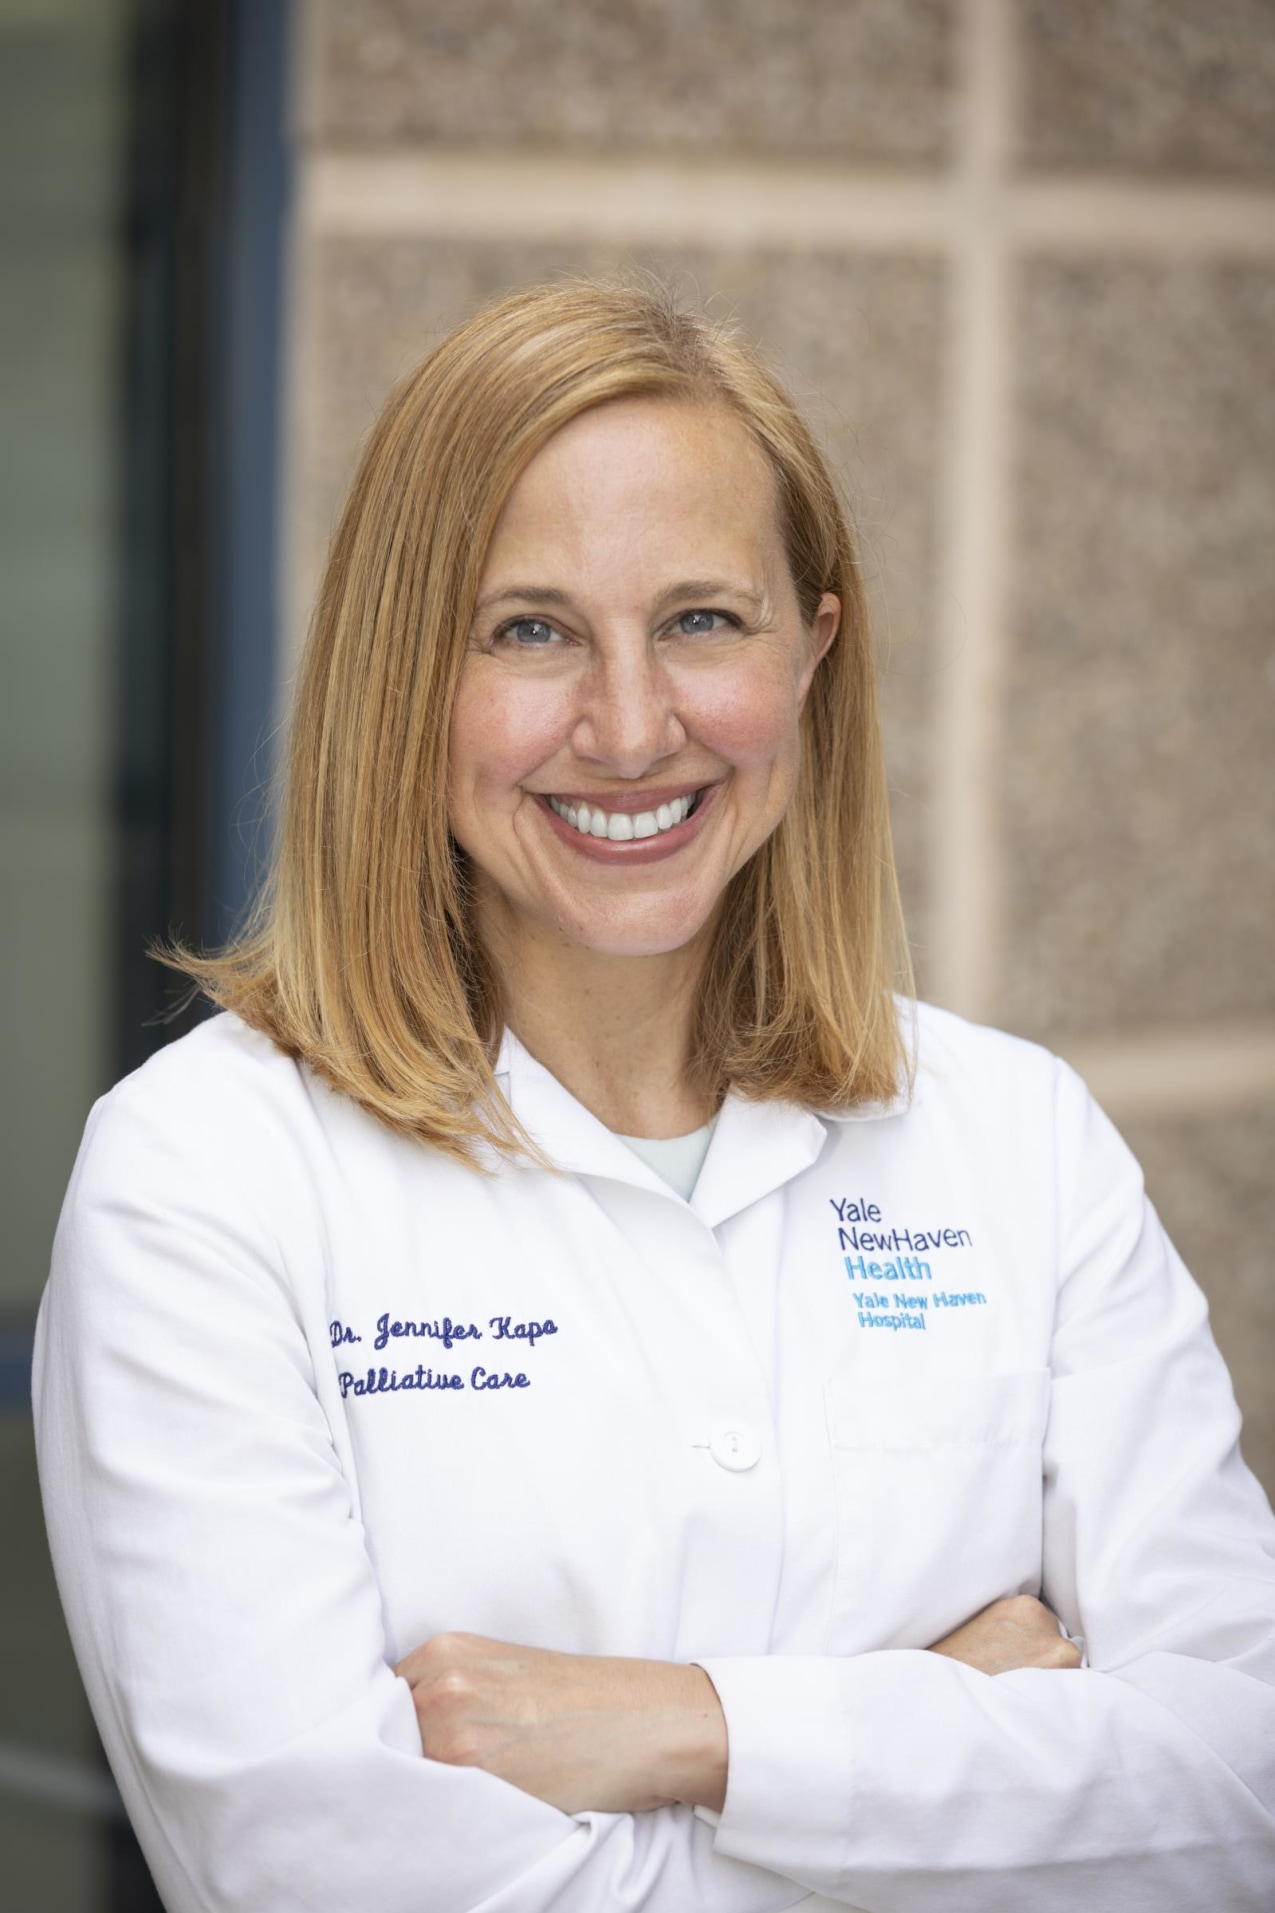 Jennifer M. Kapo, MD